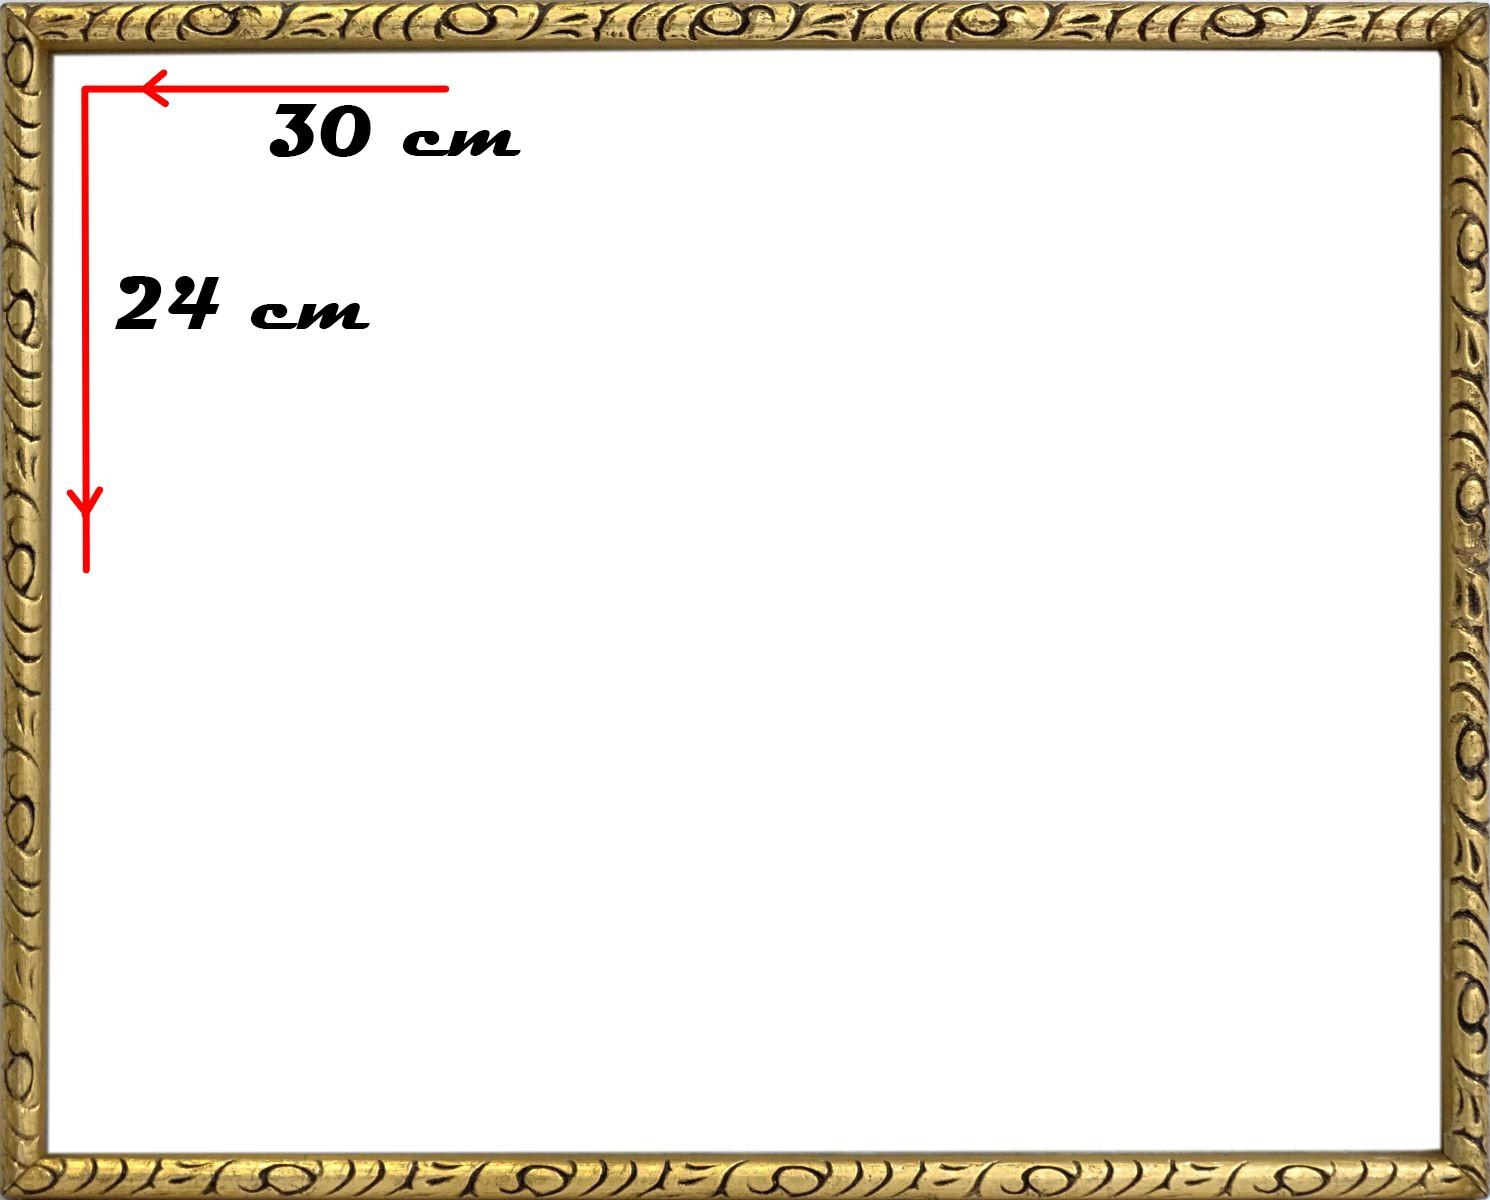 DSC09052.JPG (1490×1200)